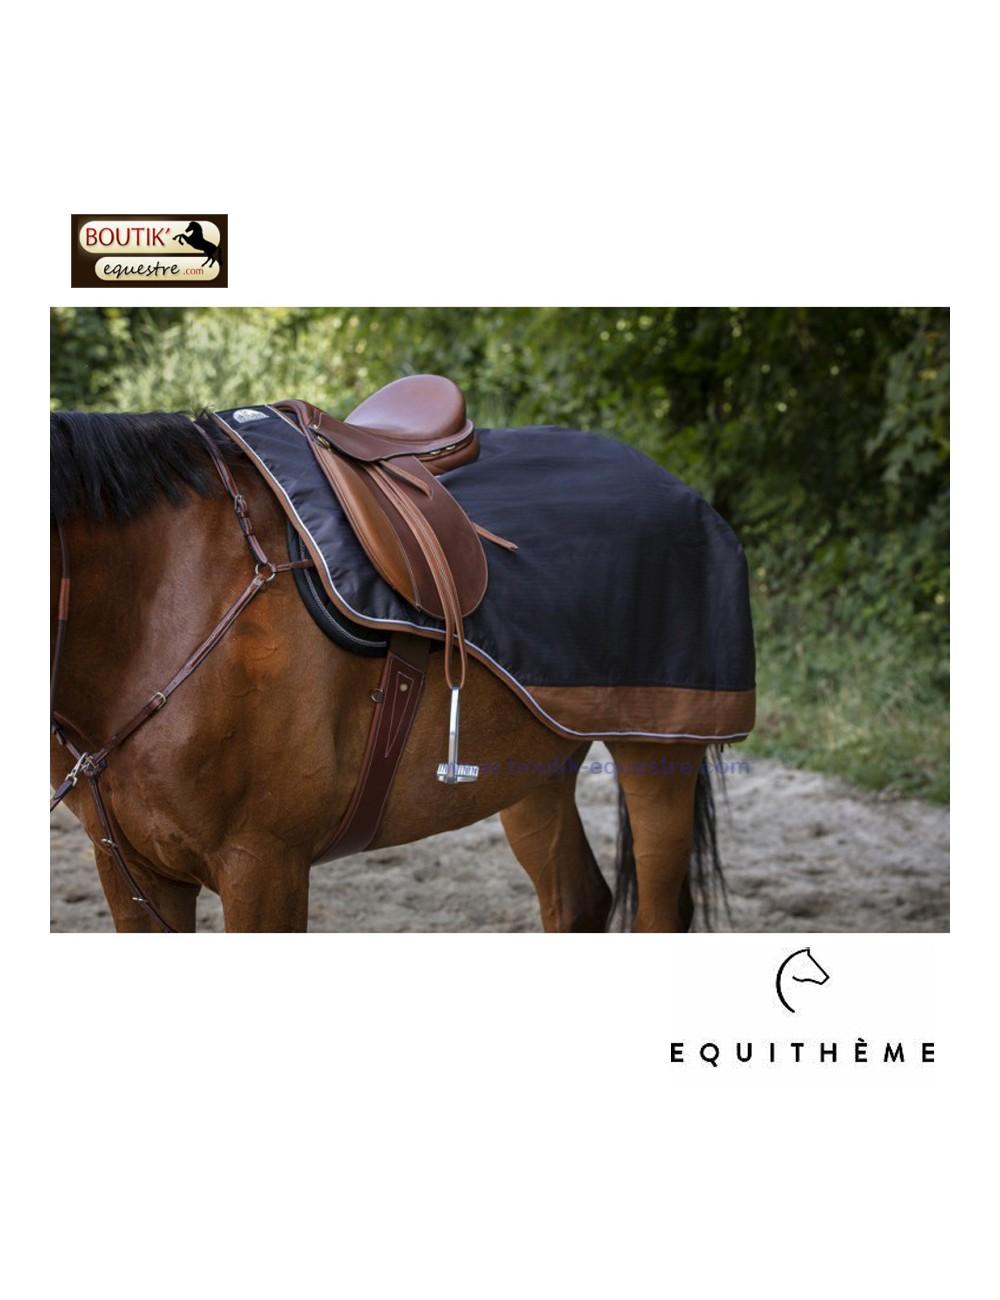 Couvre reins EQUITHEME TYREX 600D